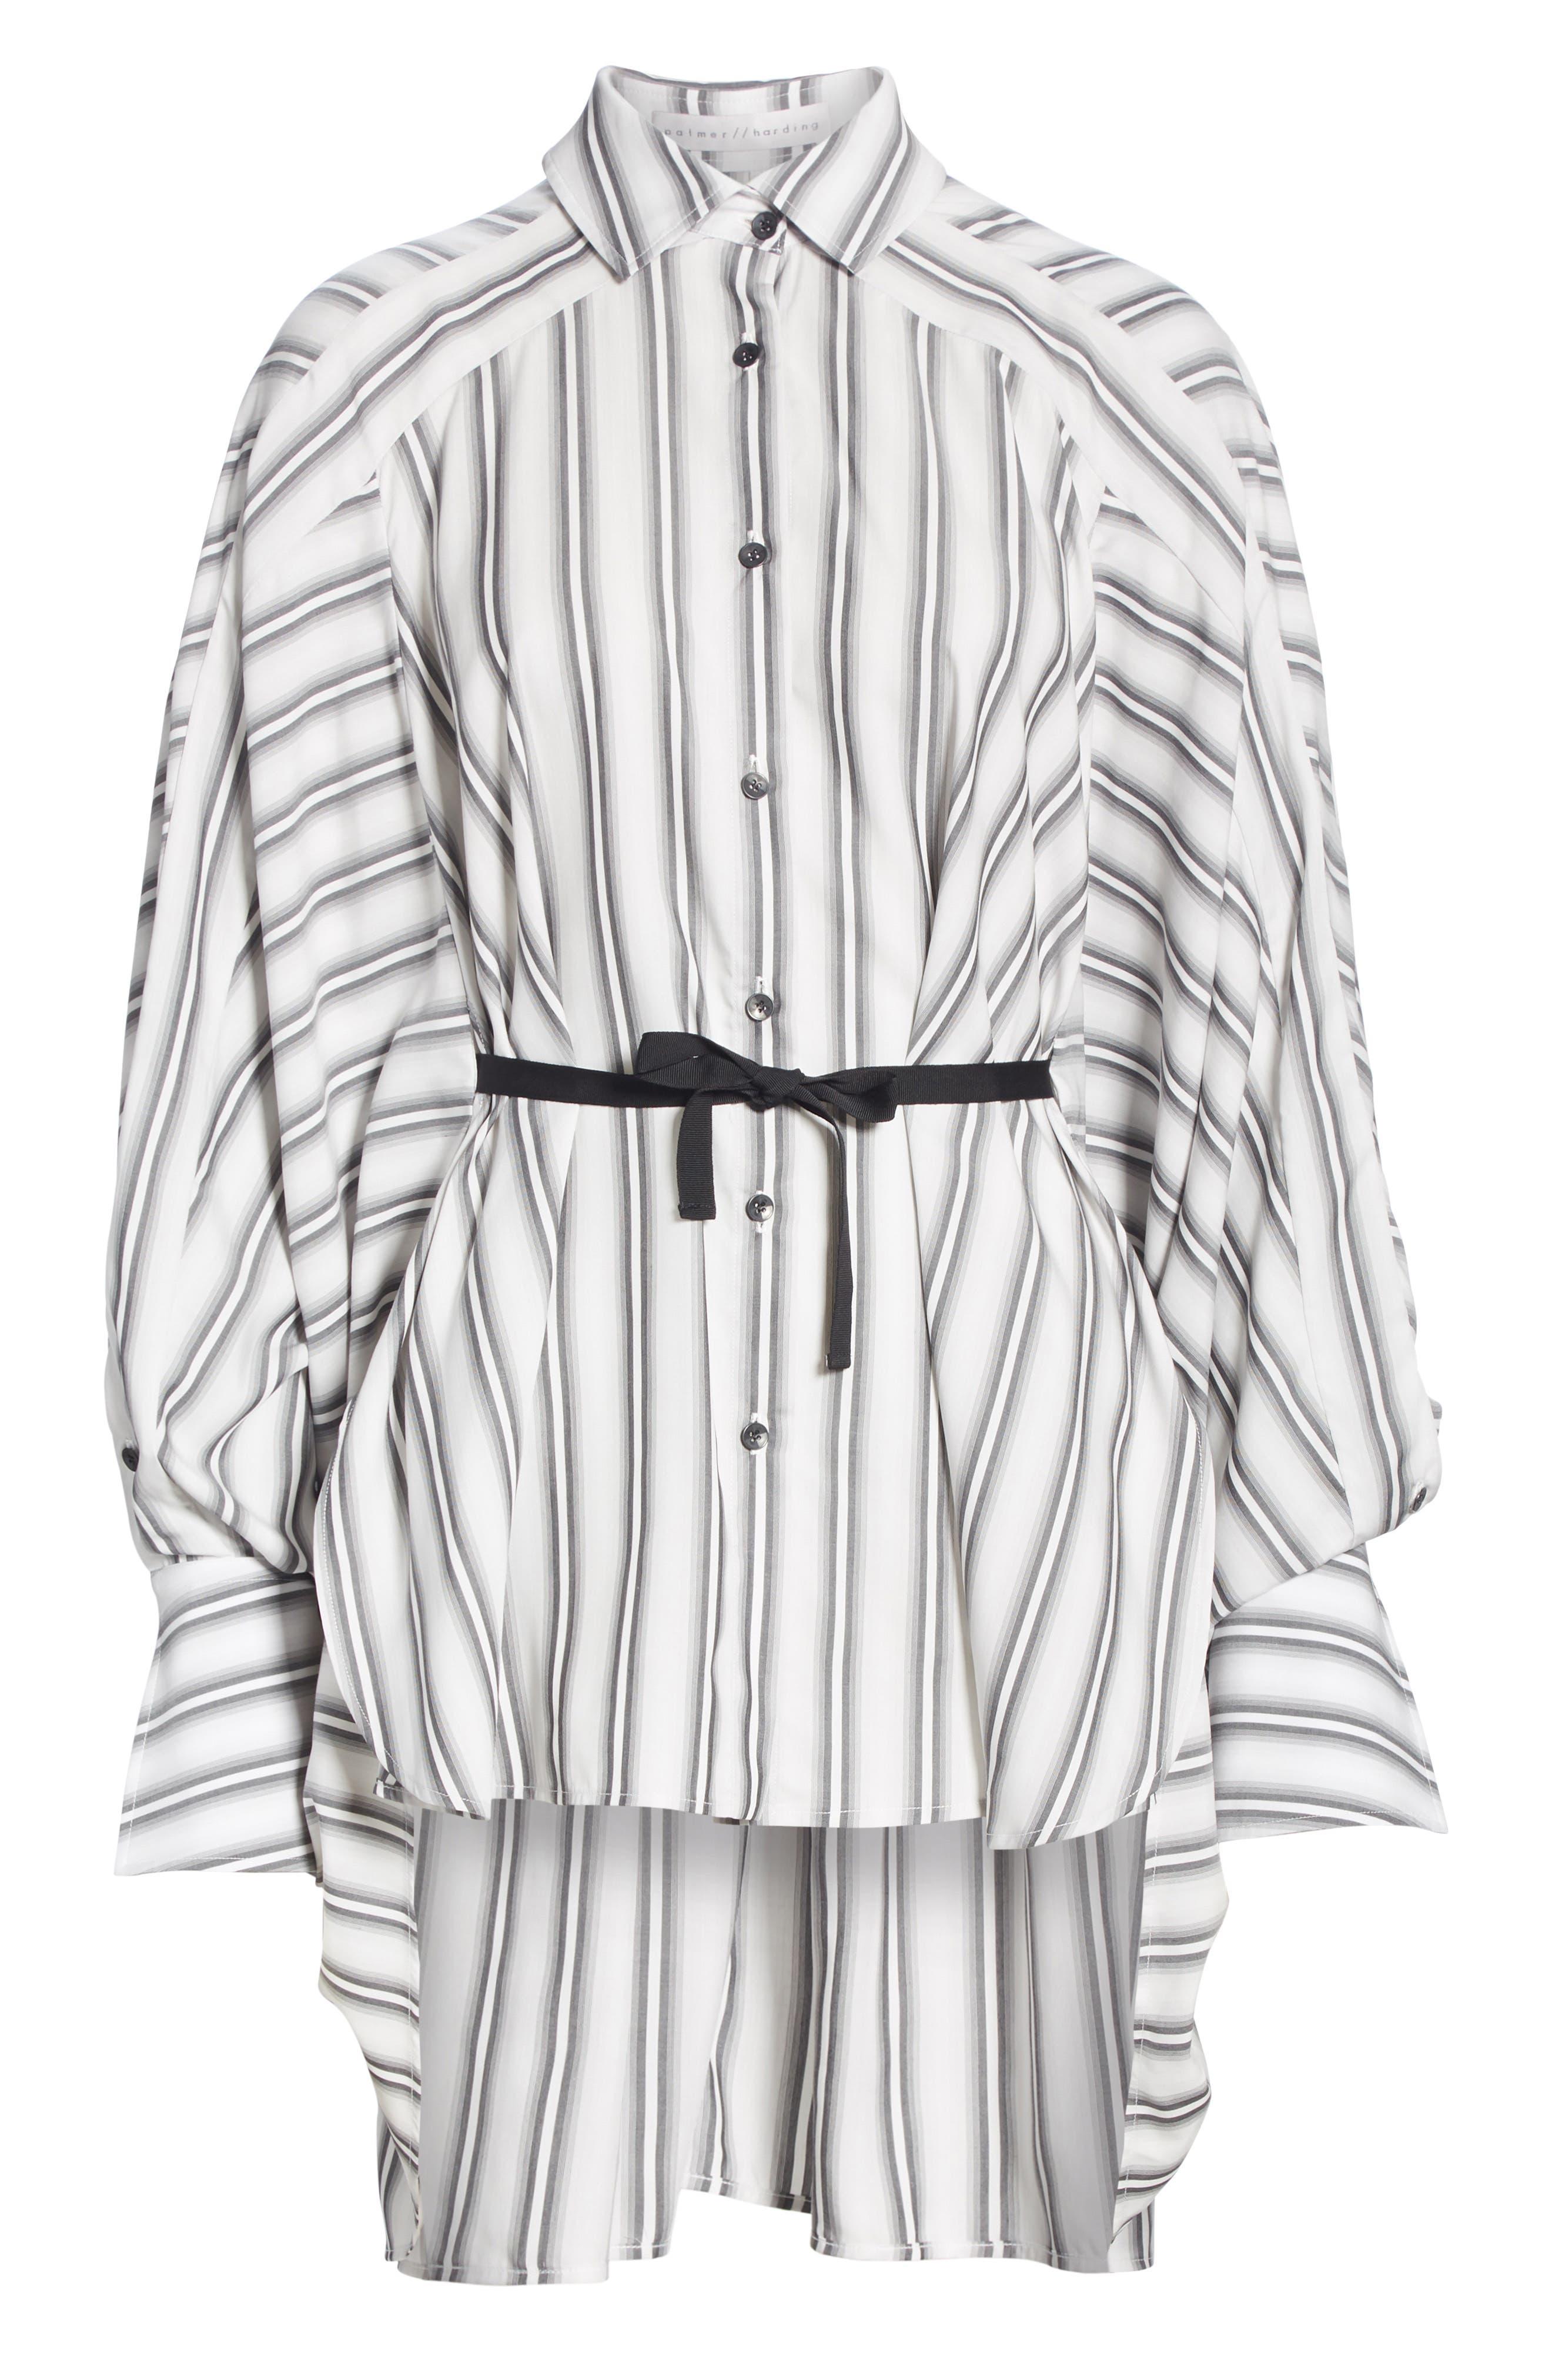 PALMER/HARDING, Streep Stripe Shirt, Alternate thumbnail 6, color, GRADIENT STRIPE WITH BLACK